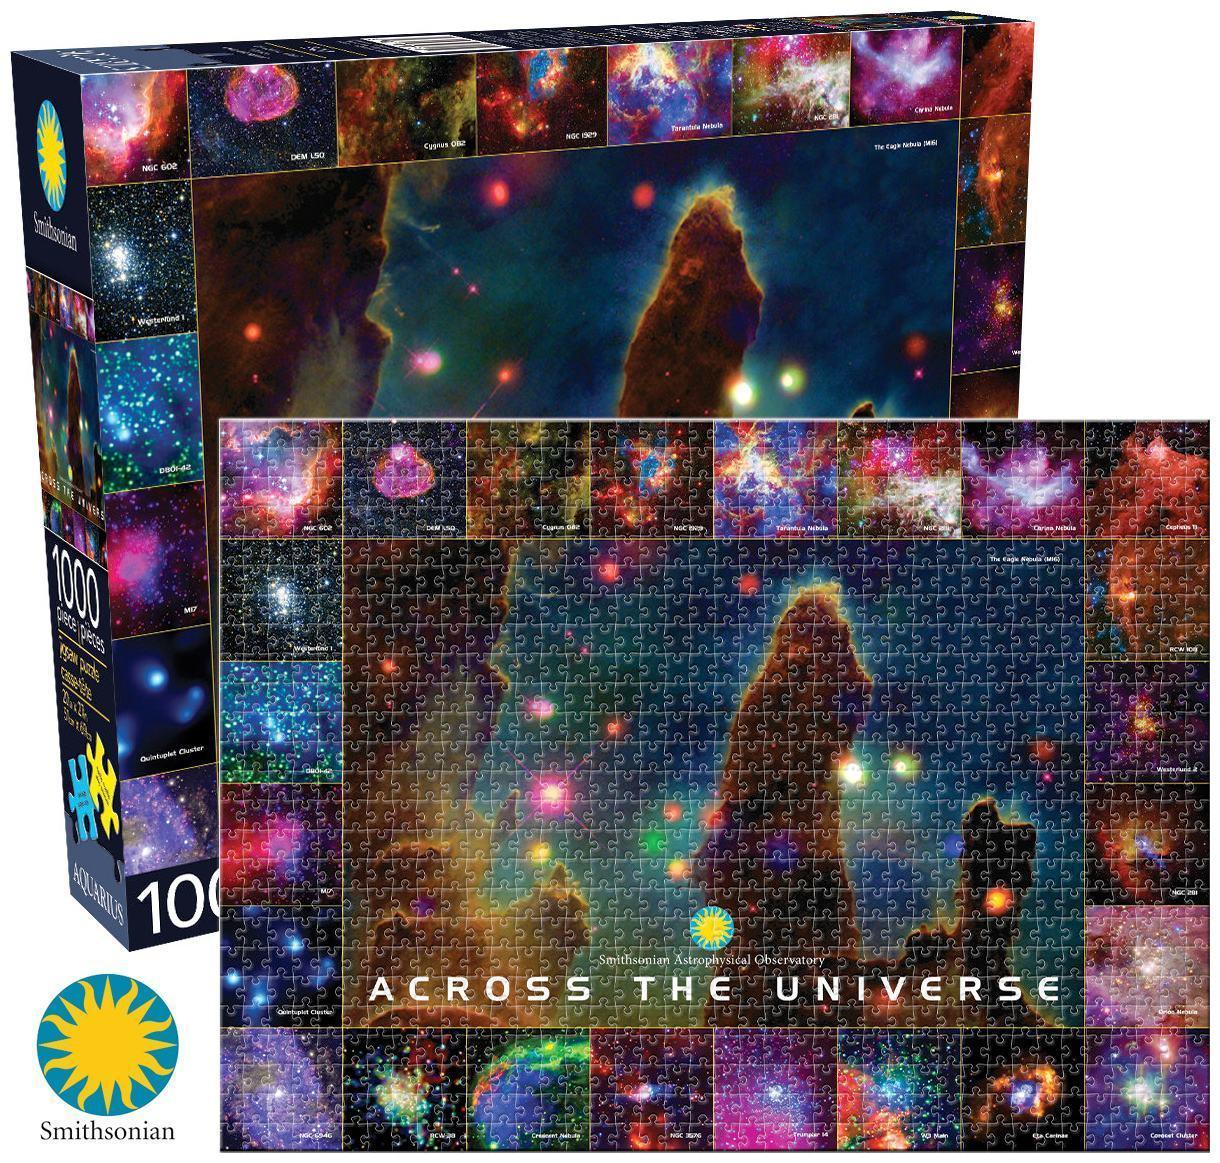 Quebra-Cabeca-Smithsonian-Across-the-Universe-1000-Piece-Puzzle-03